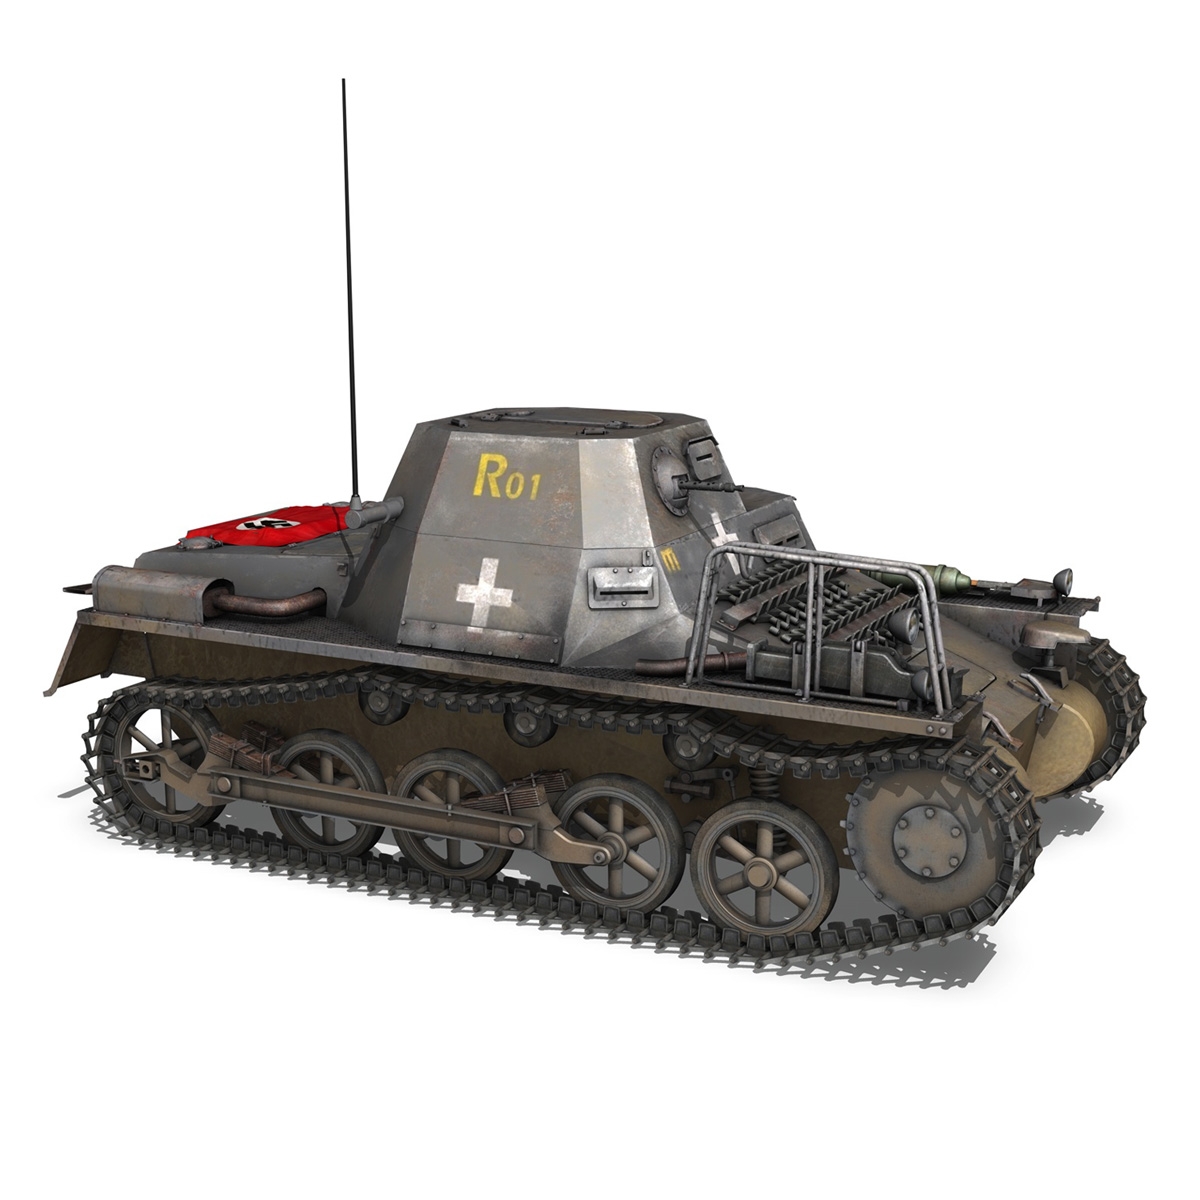 sd.kfz 265 – klpzbefwg – ausf. a – r01 3d model 3ds fbx c4d lwo obj 189830